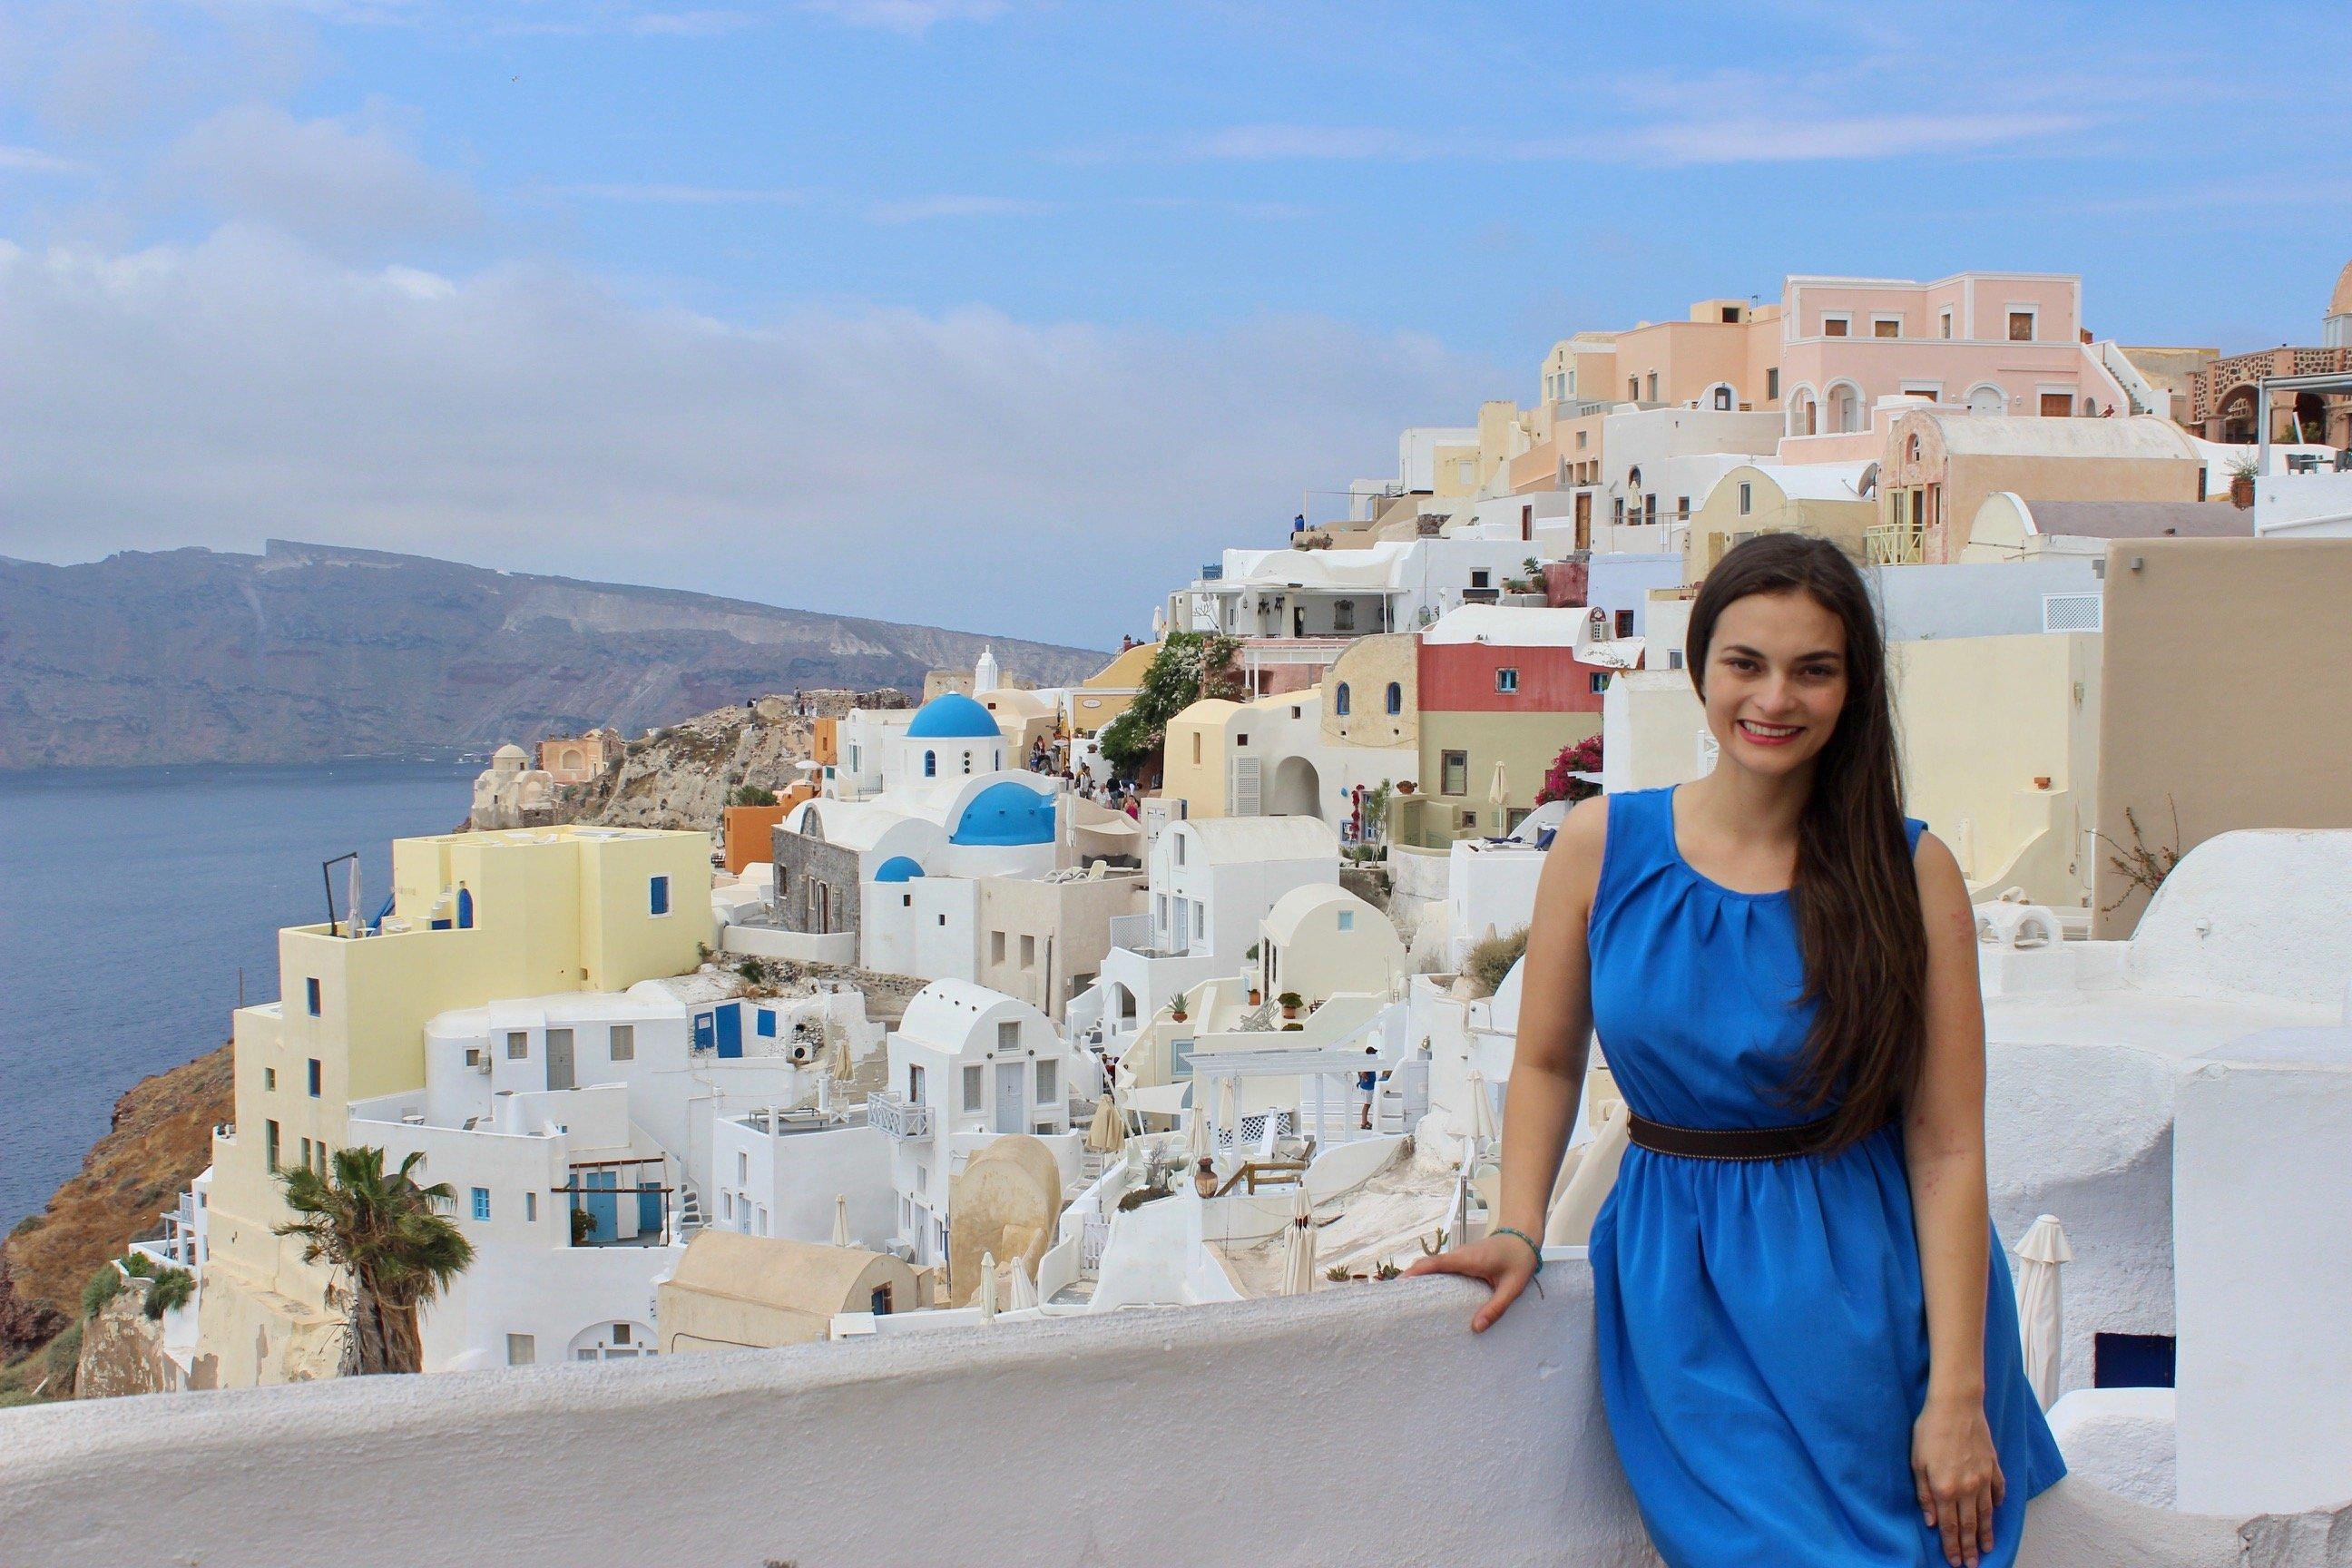 Enjoying the view in Santorini,